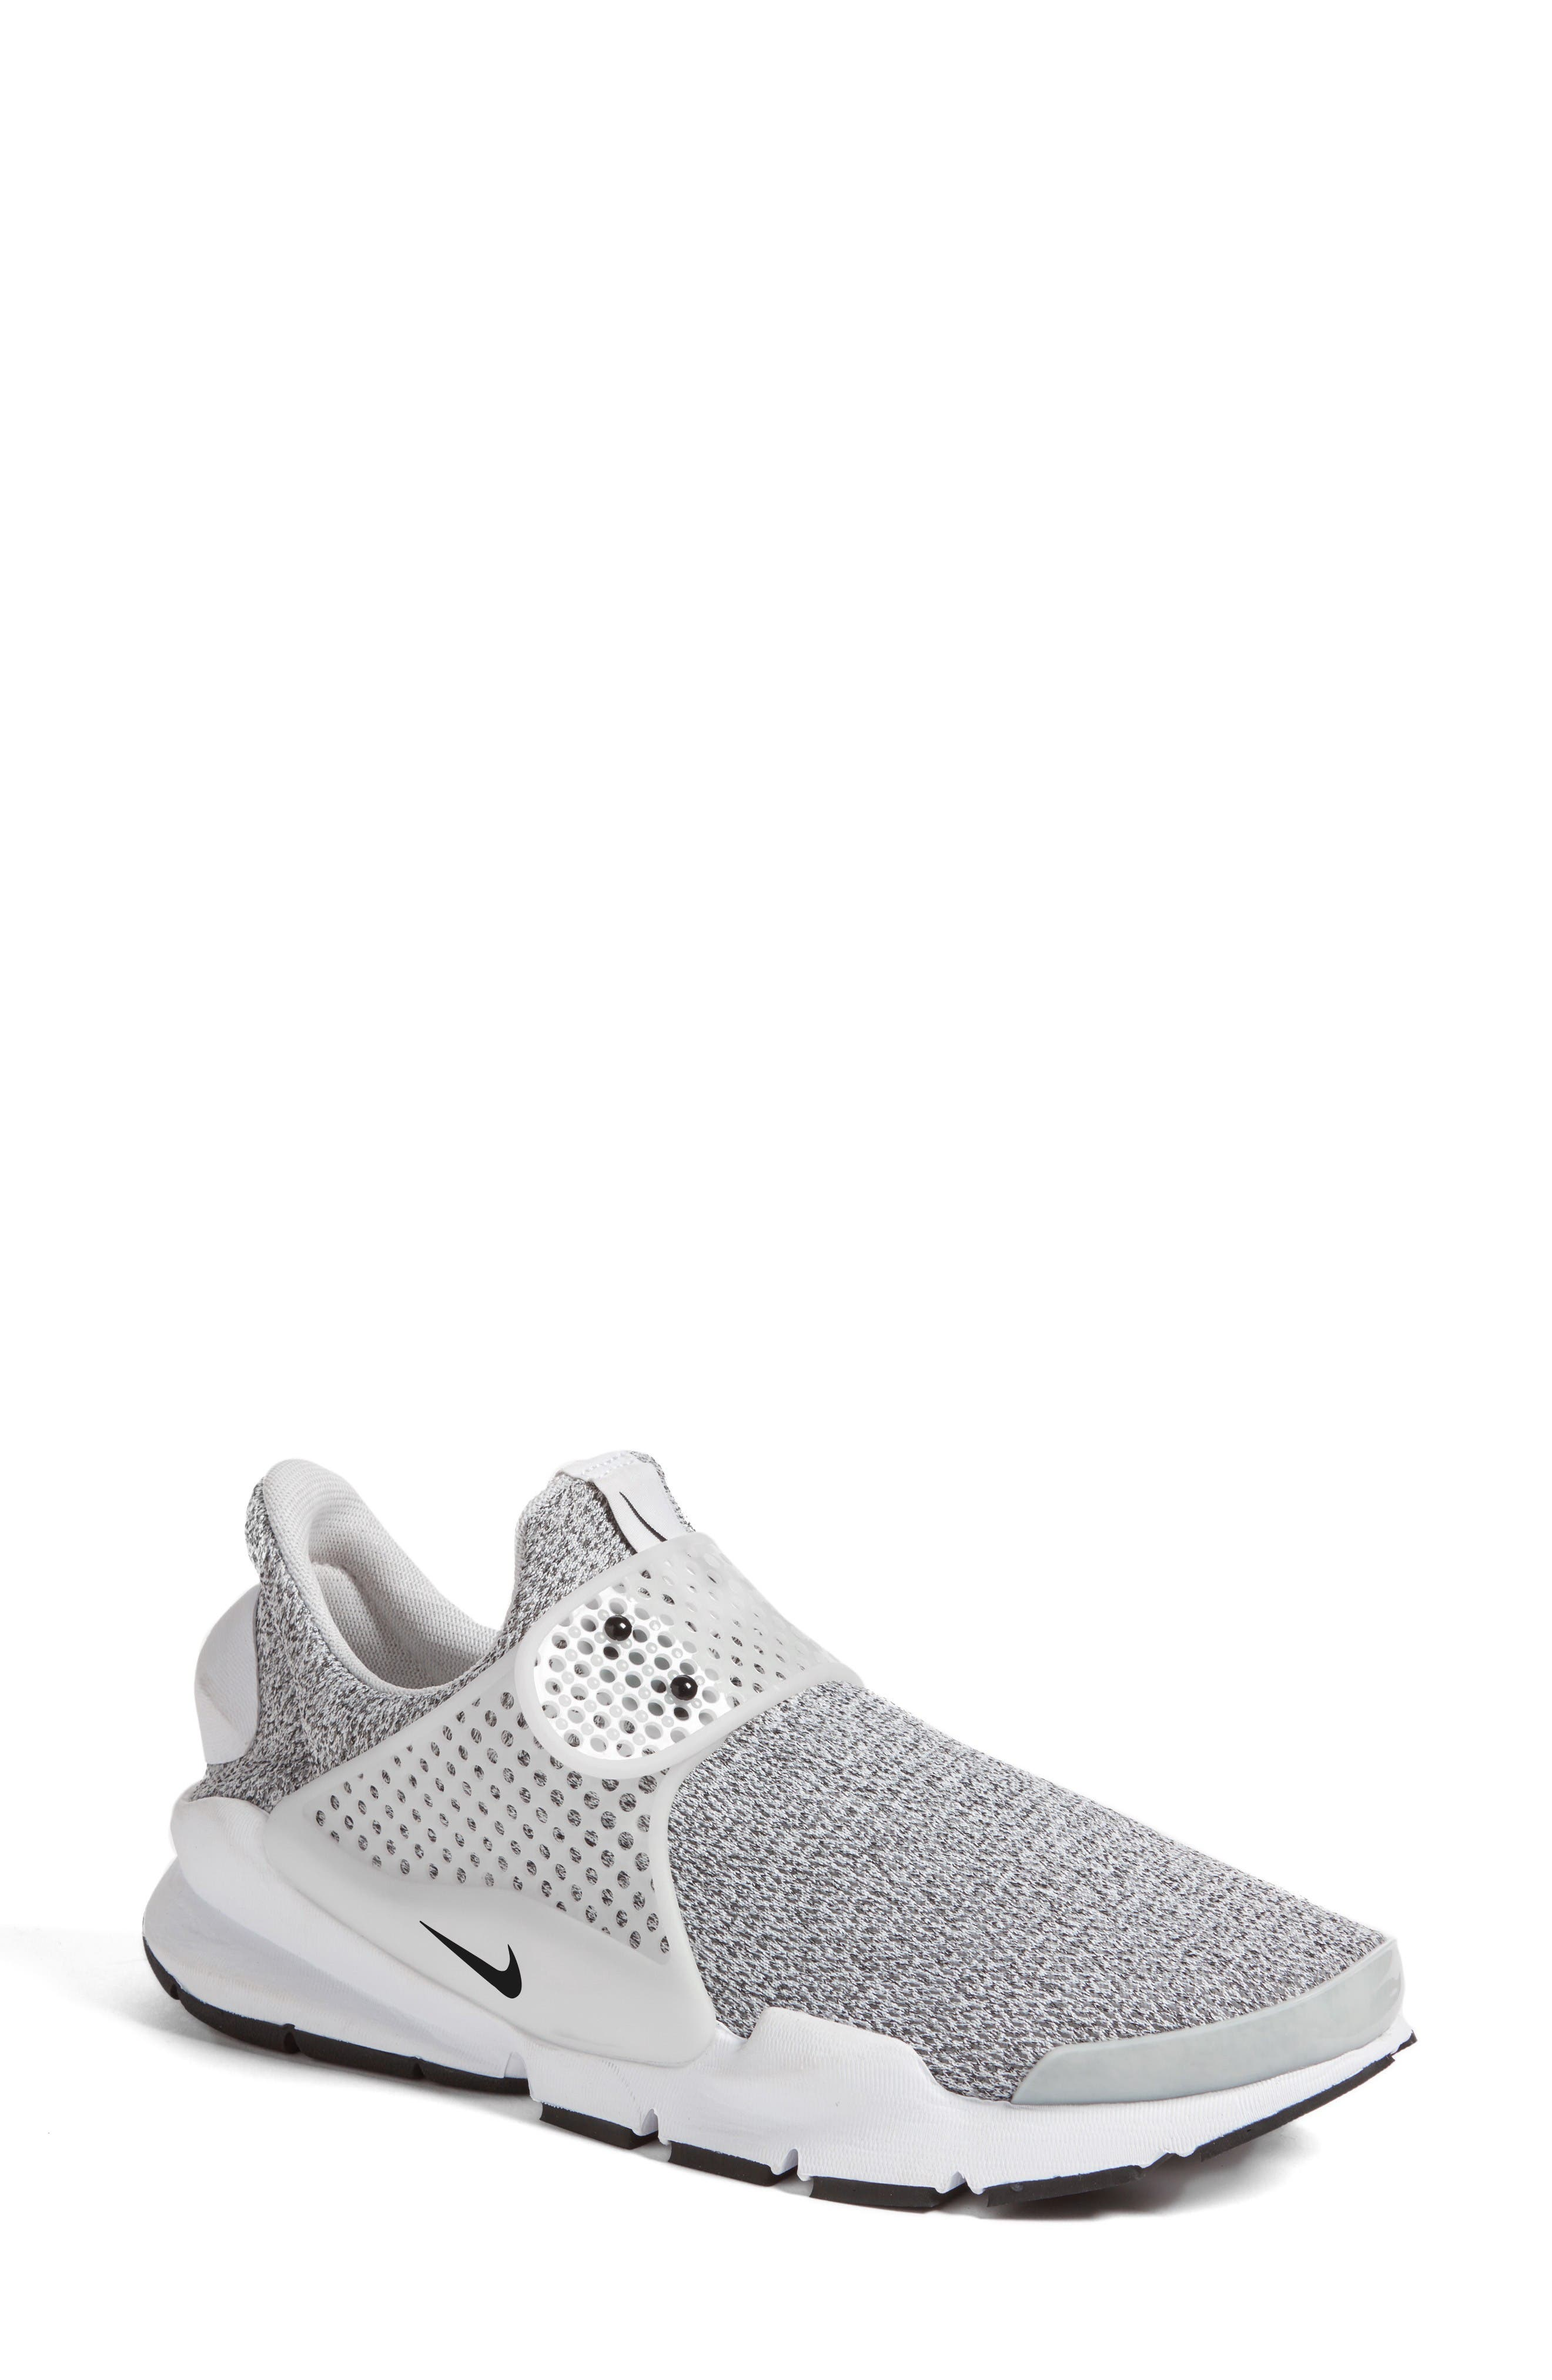 Main Image - Nike Sock Dart Sneaker (Women)